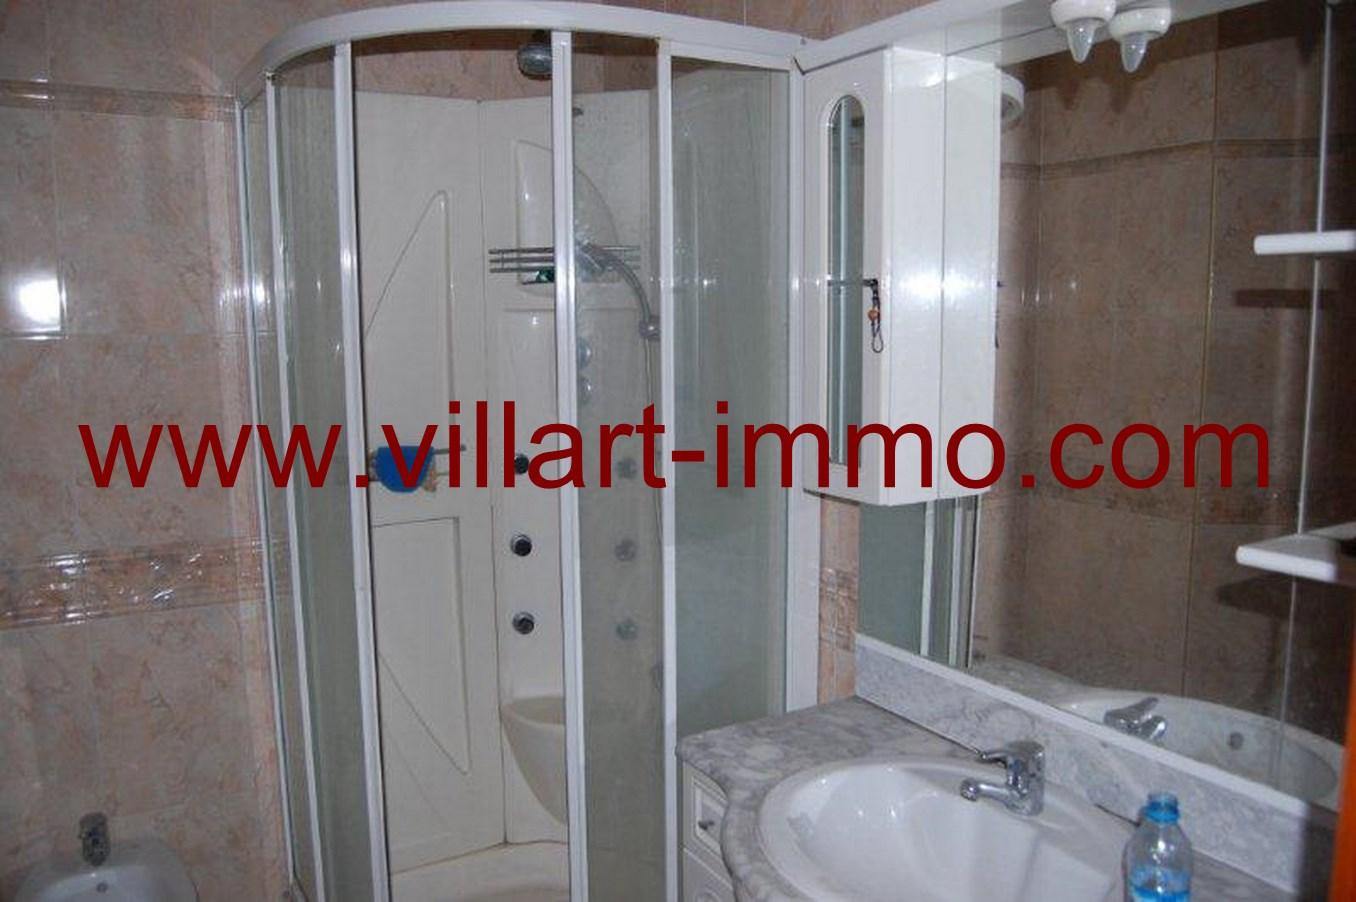 6-Location-Appartement-Non meublé-Tanger-Salle de bain-L662-Villart immo